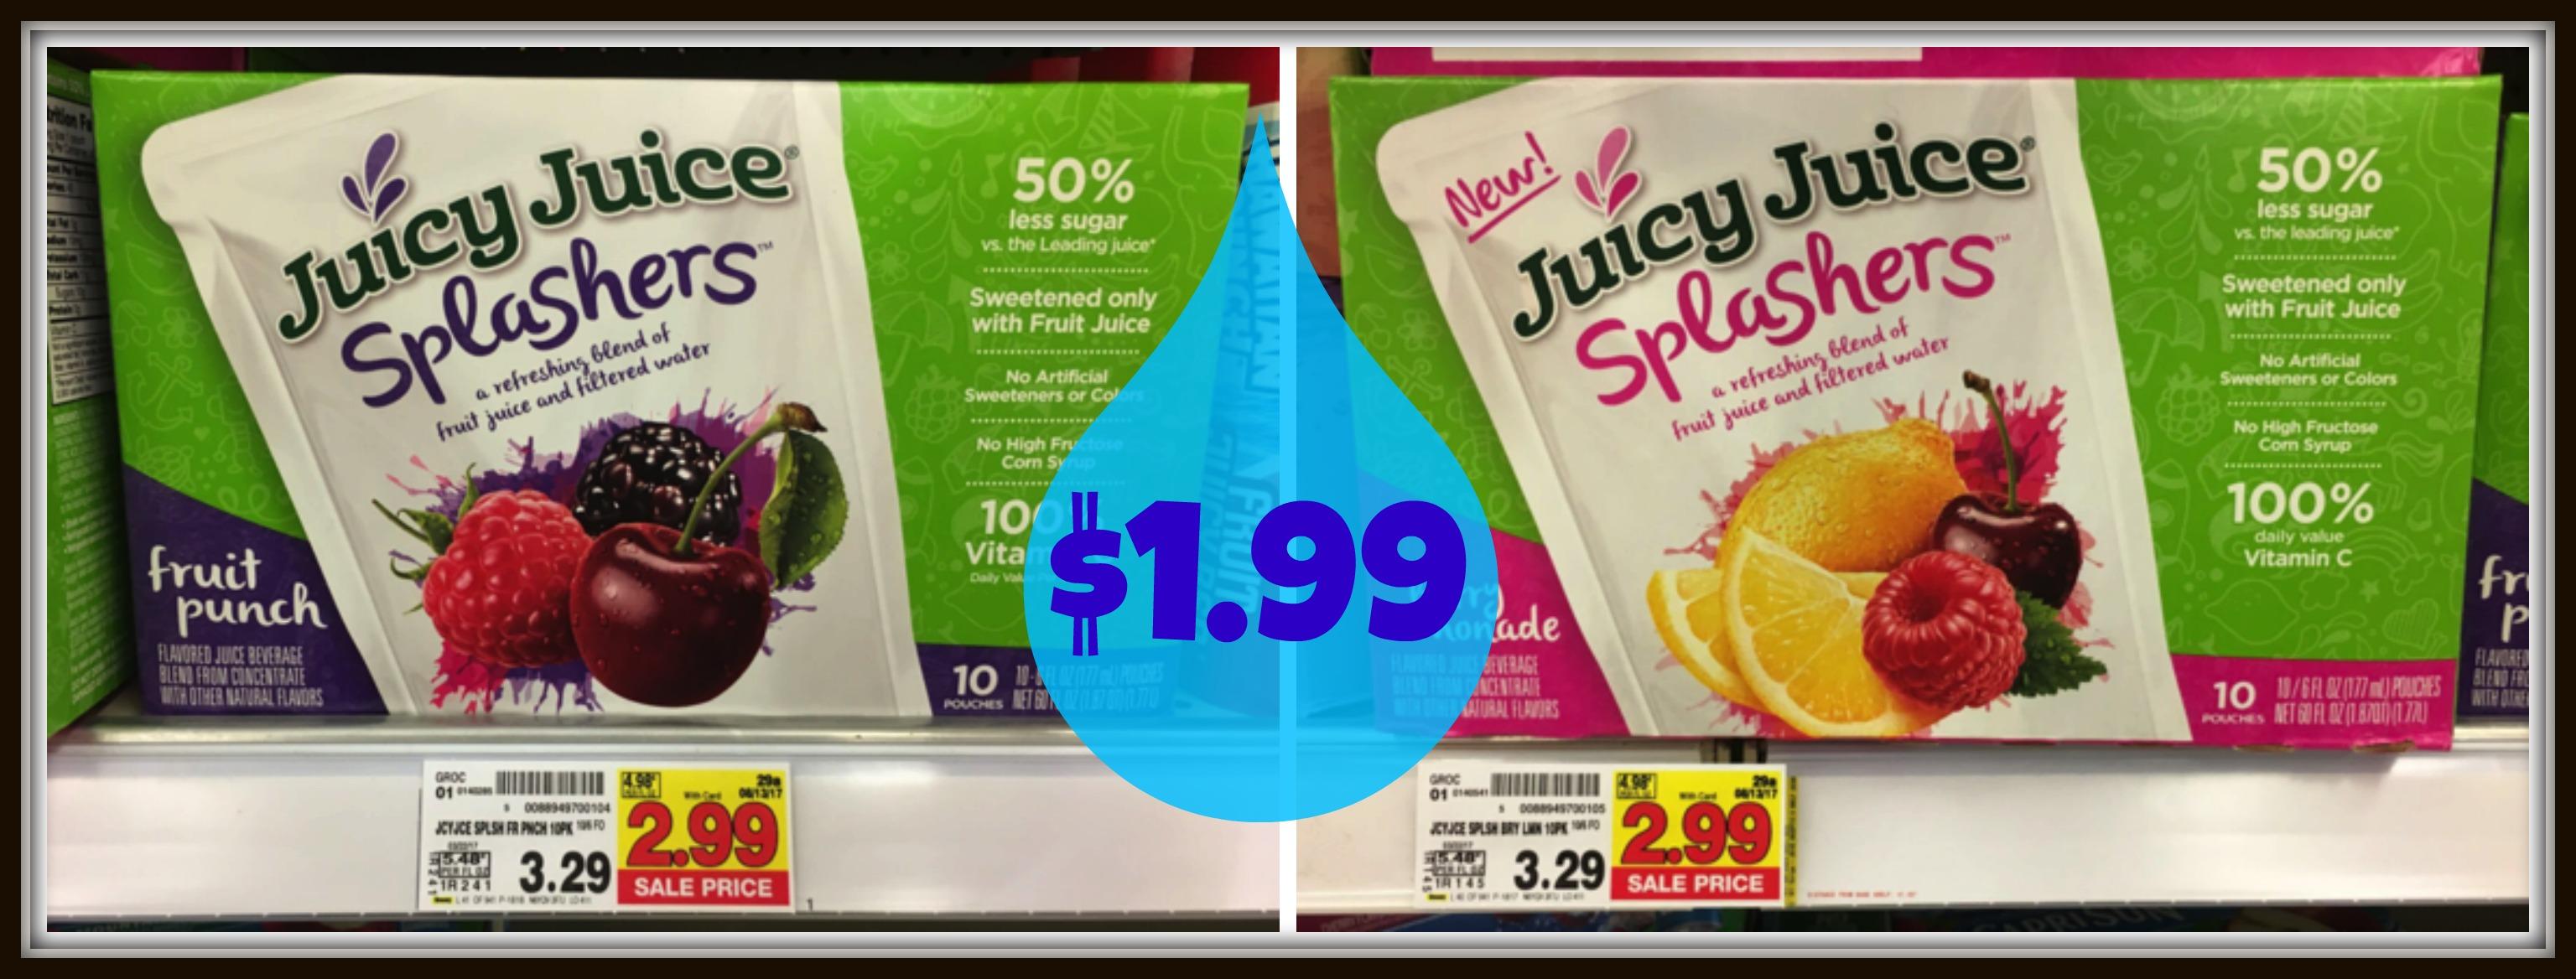 juicy juice splashers Image